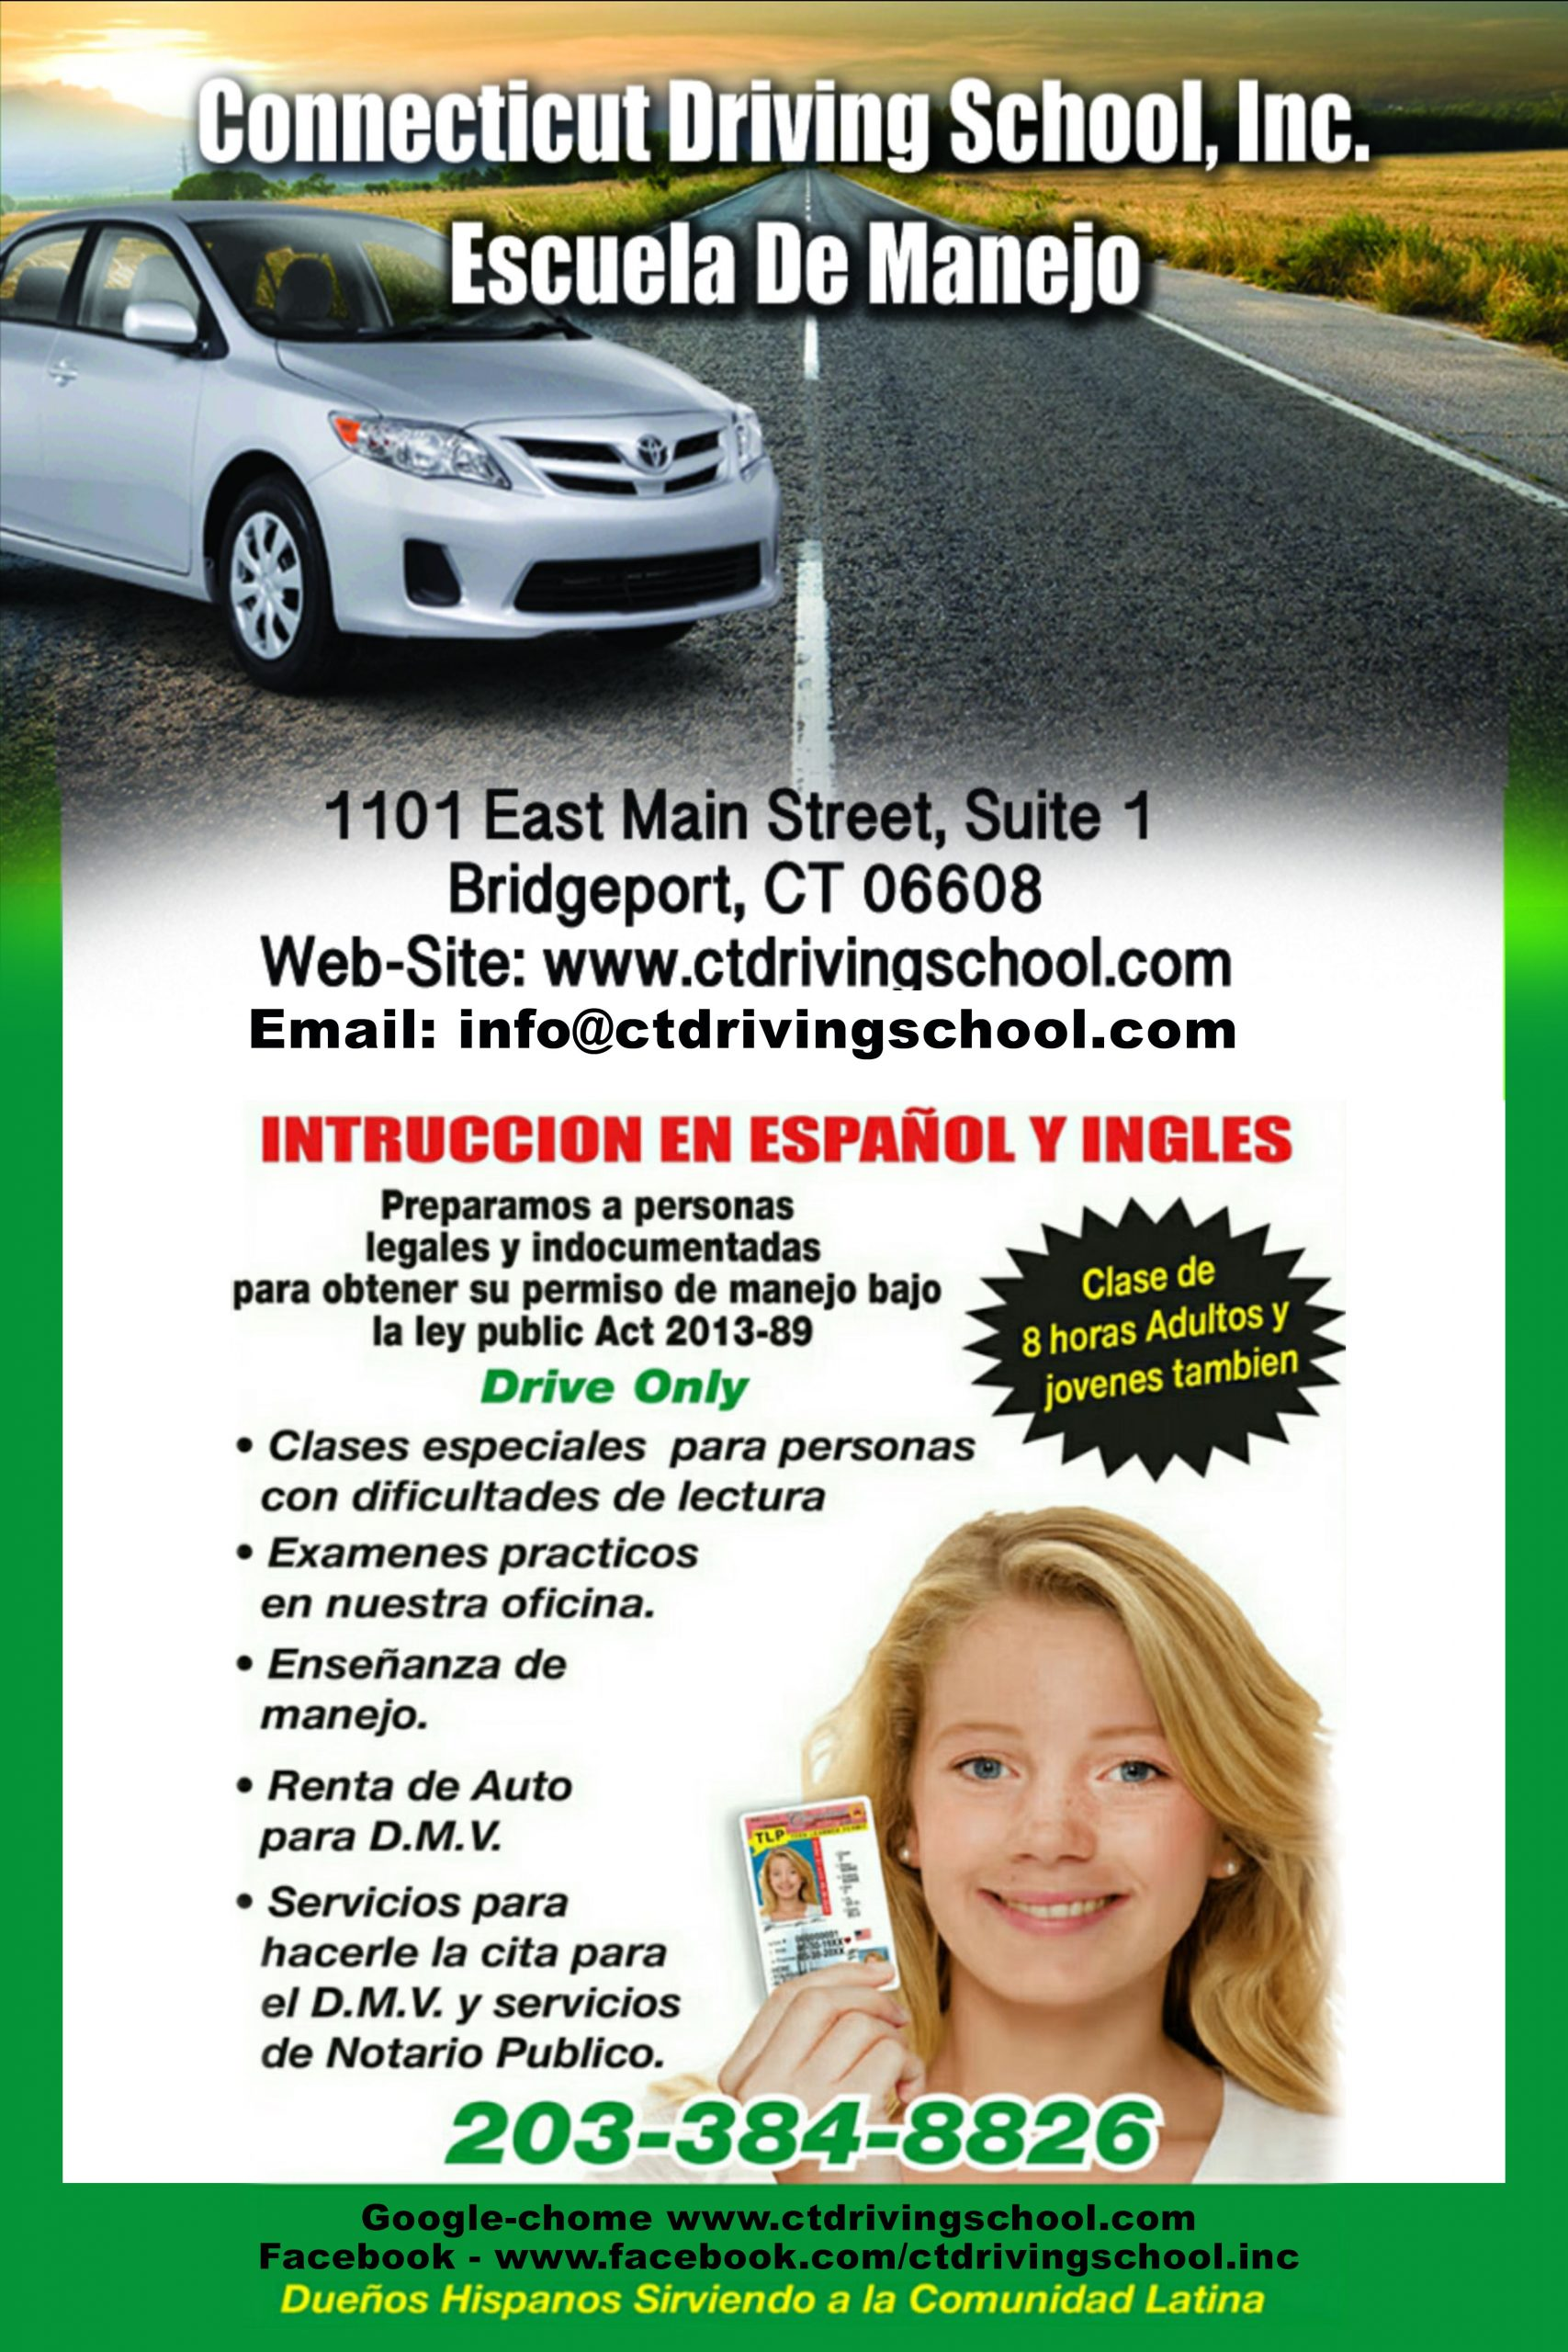 Connecticut Driving School, Inc.